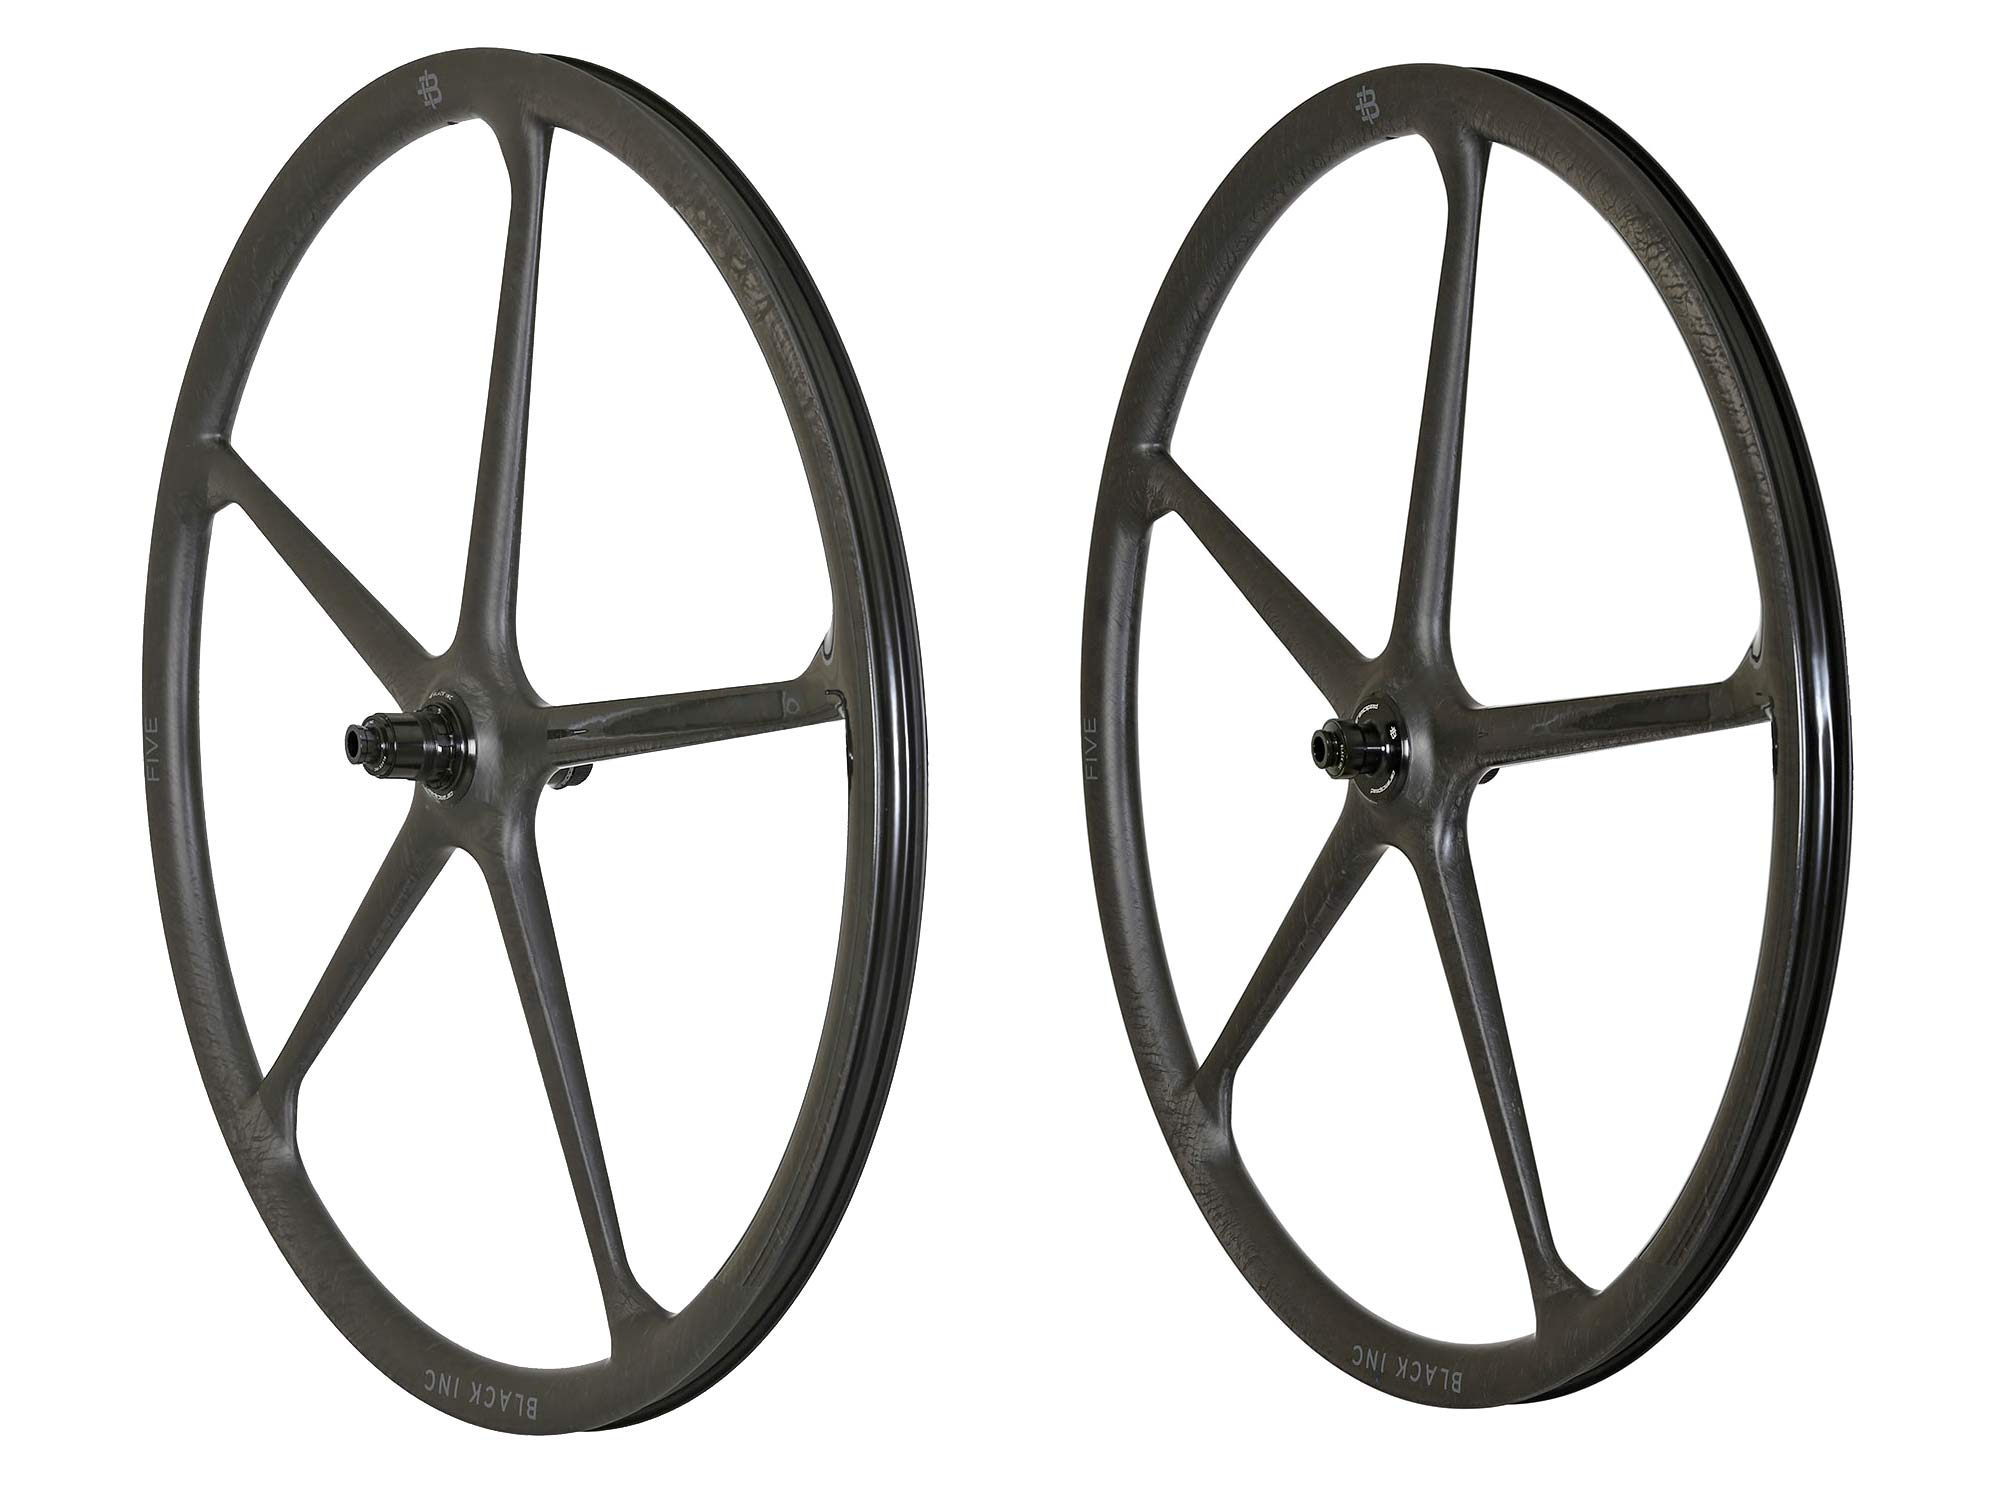 Black Inc FIVE aero carbon 5-spoke tubeless disc brake road bike wheels,angled pair